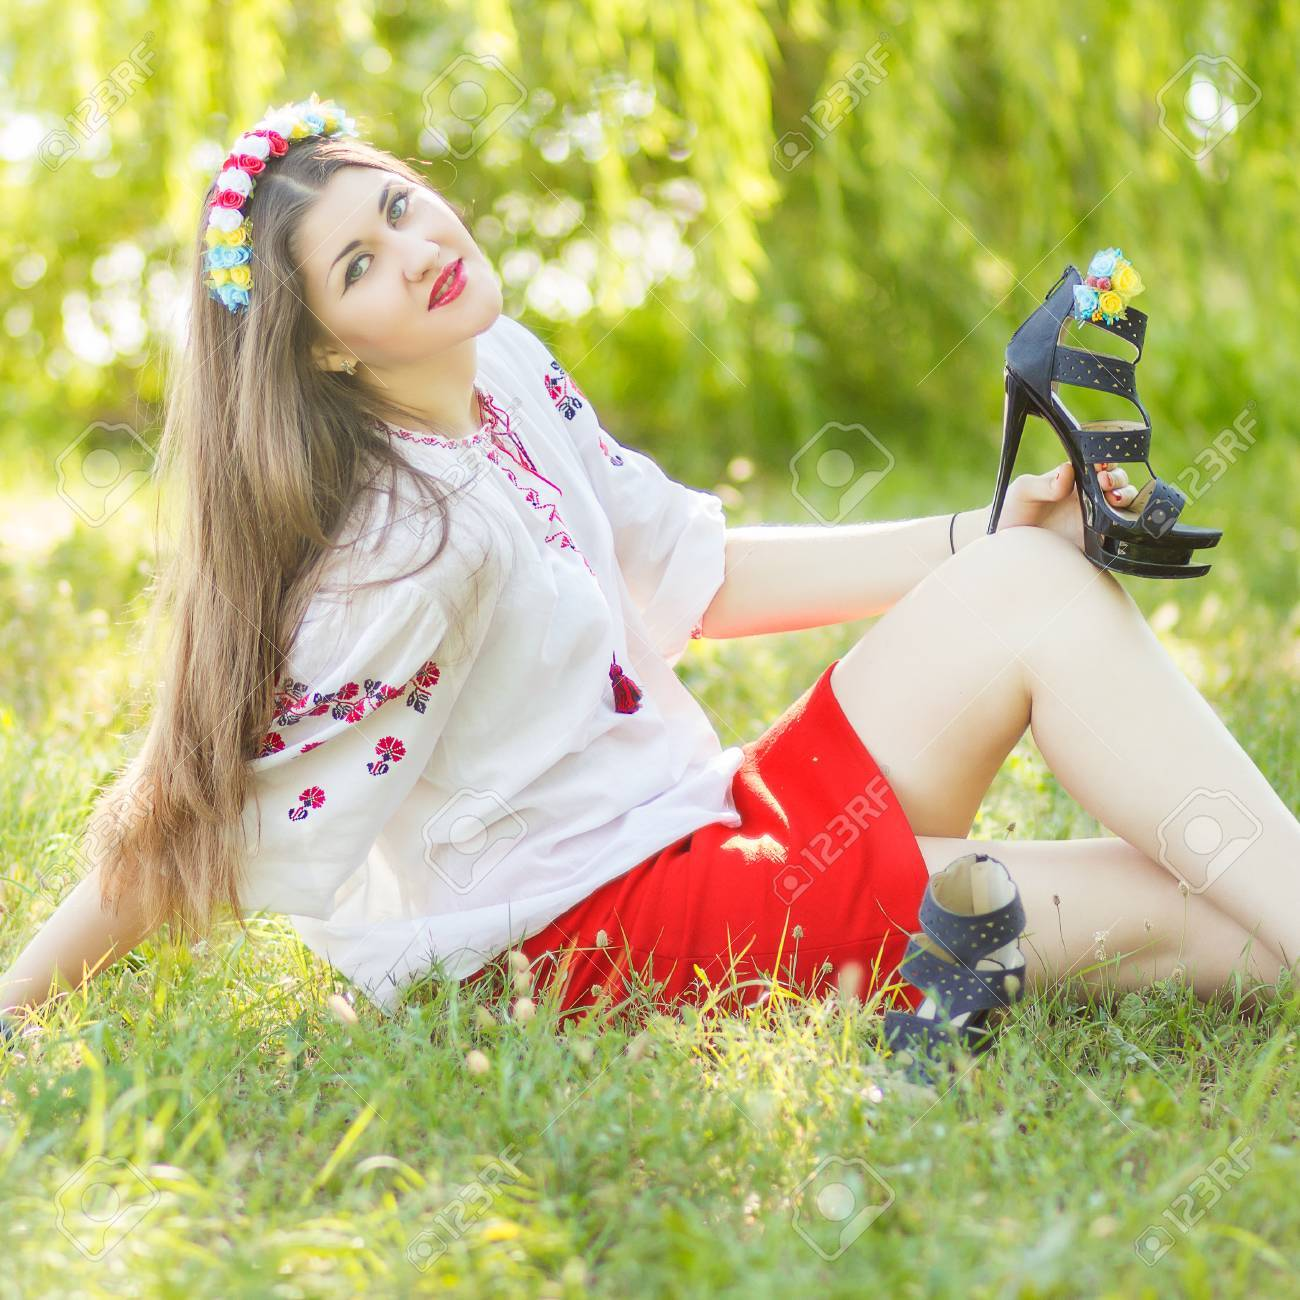 Девушка позирует лежа на траве фото фото 745-664